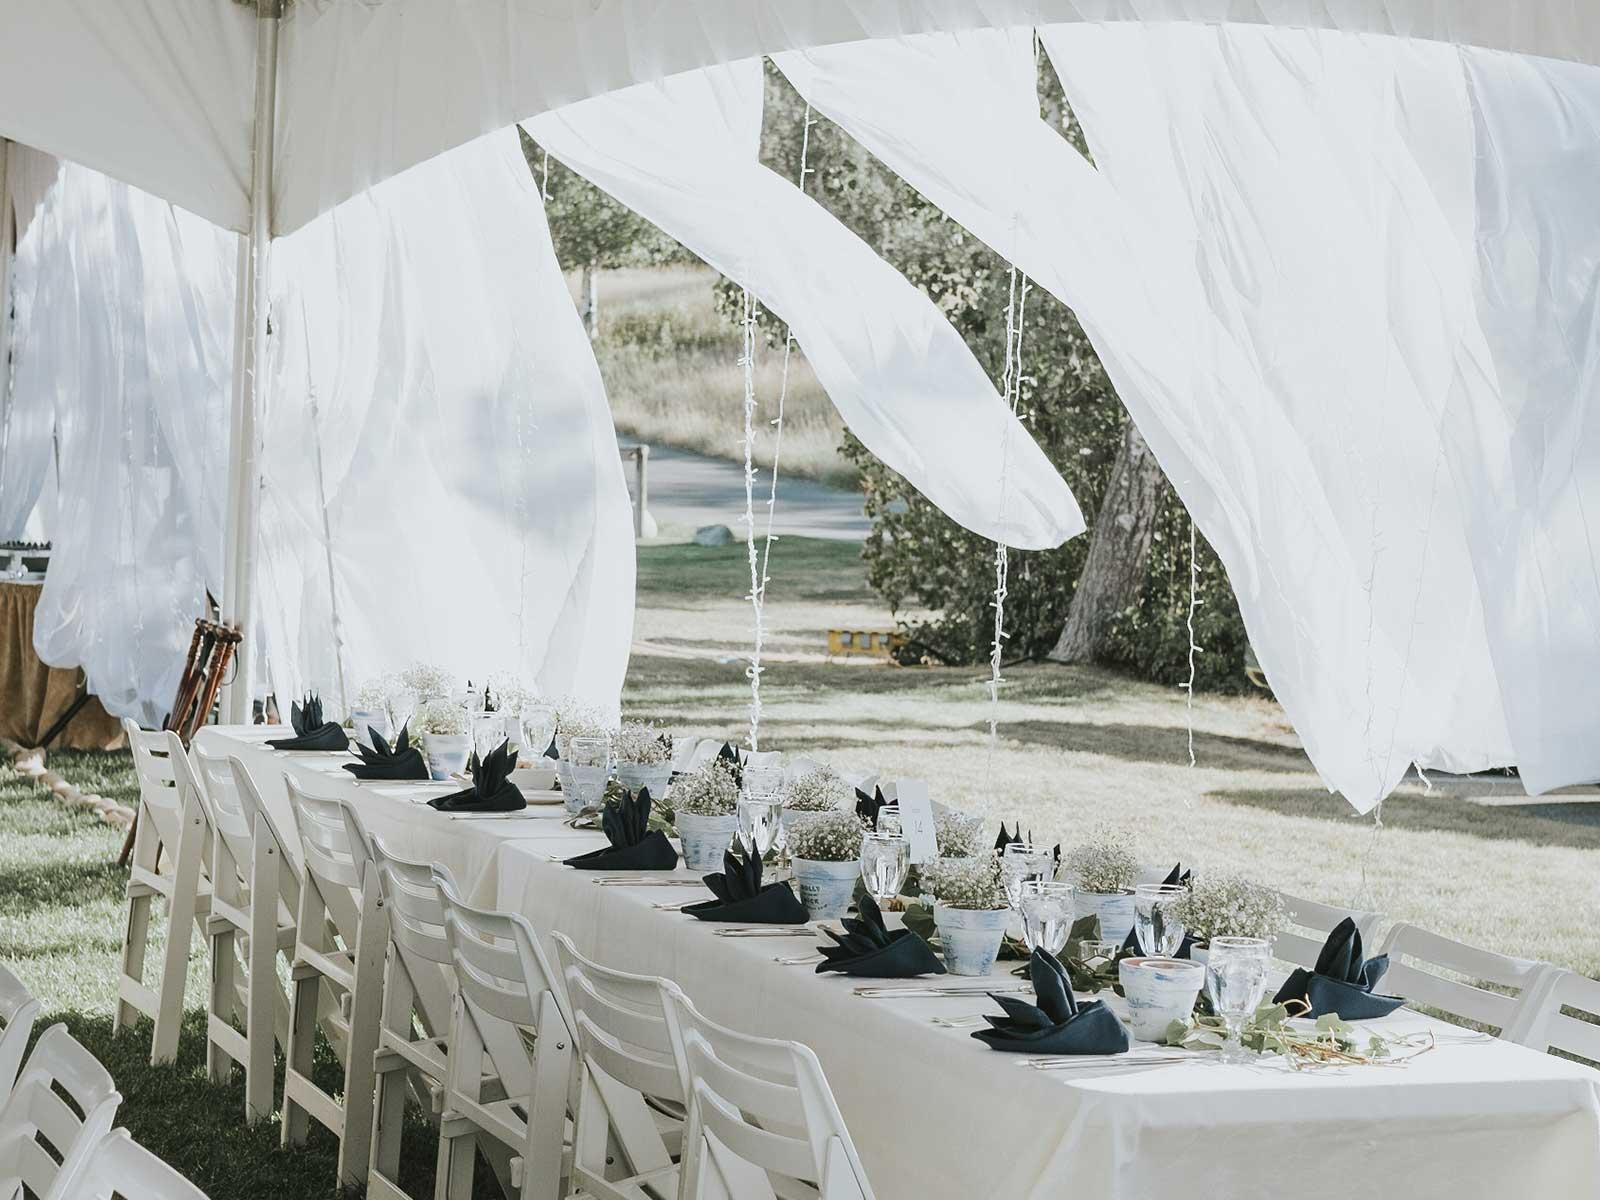 long banquet tables under tent